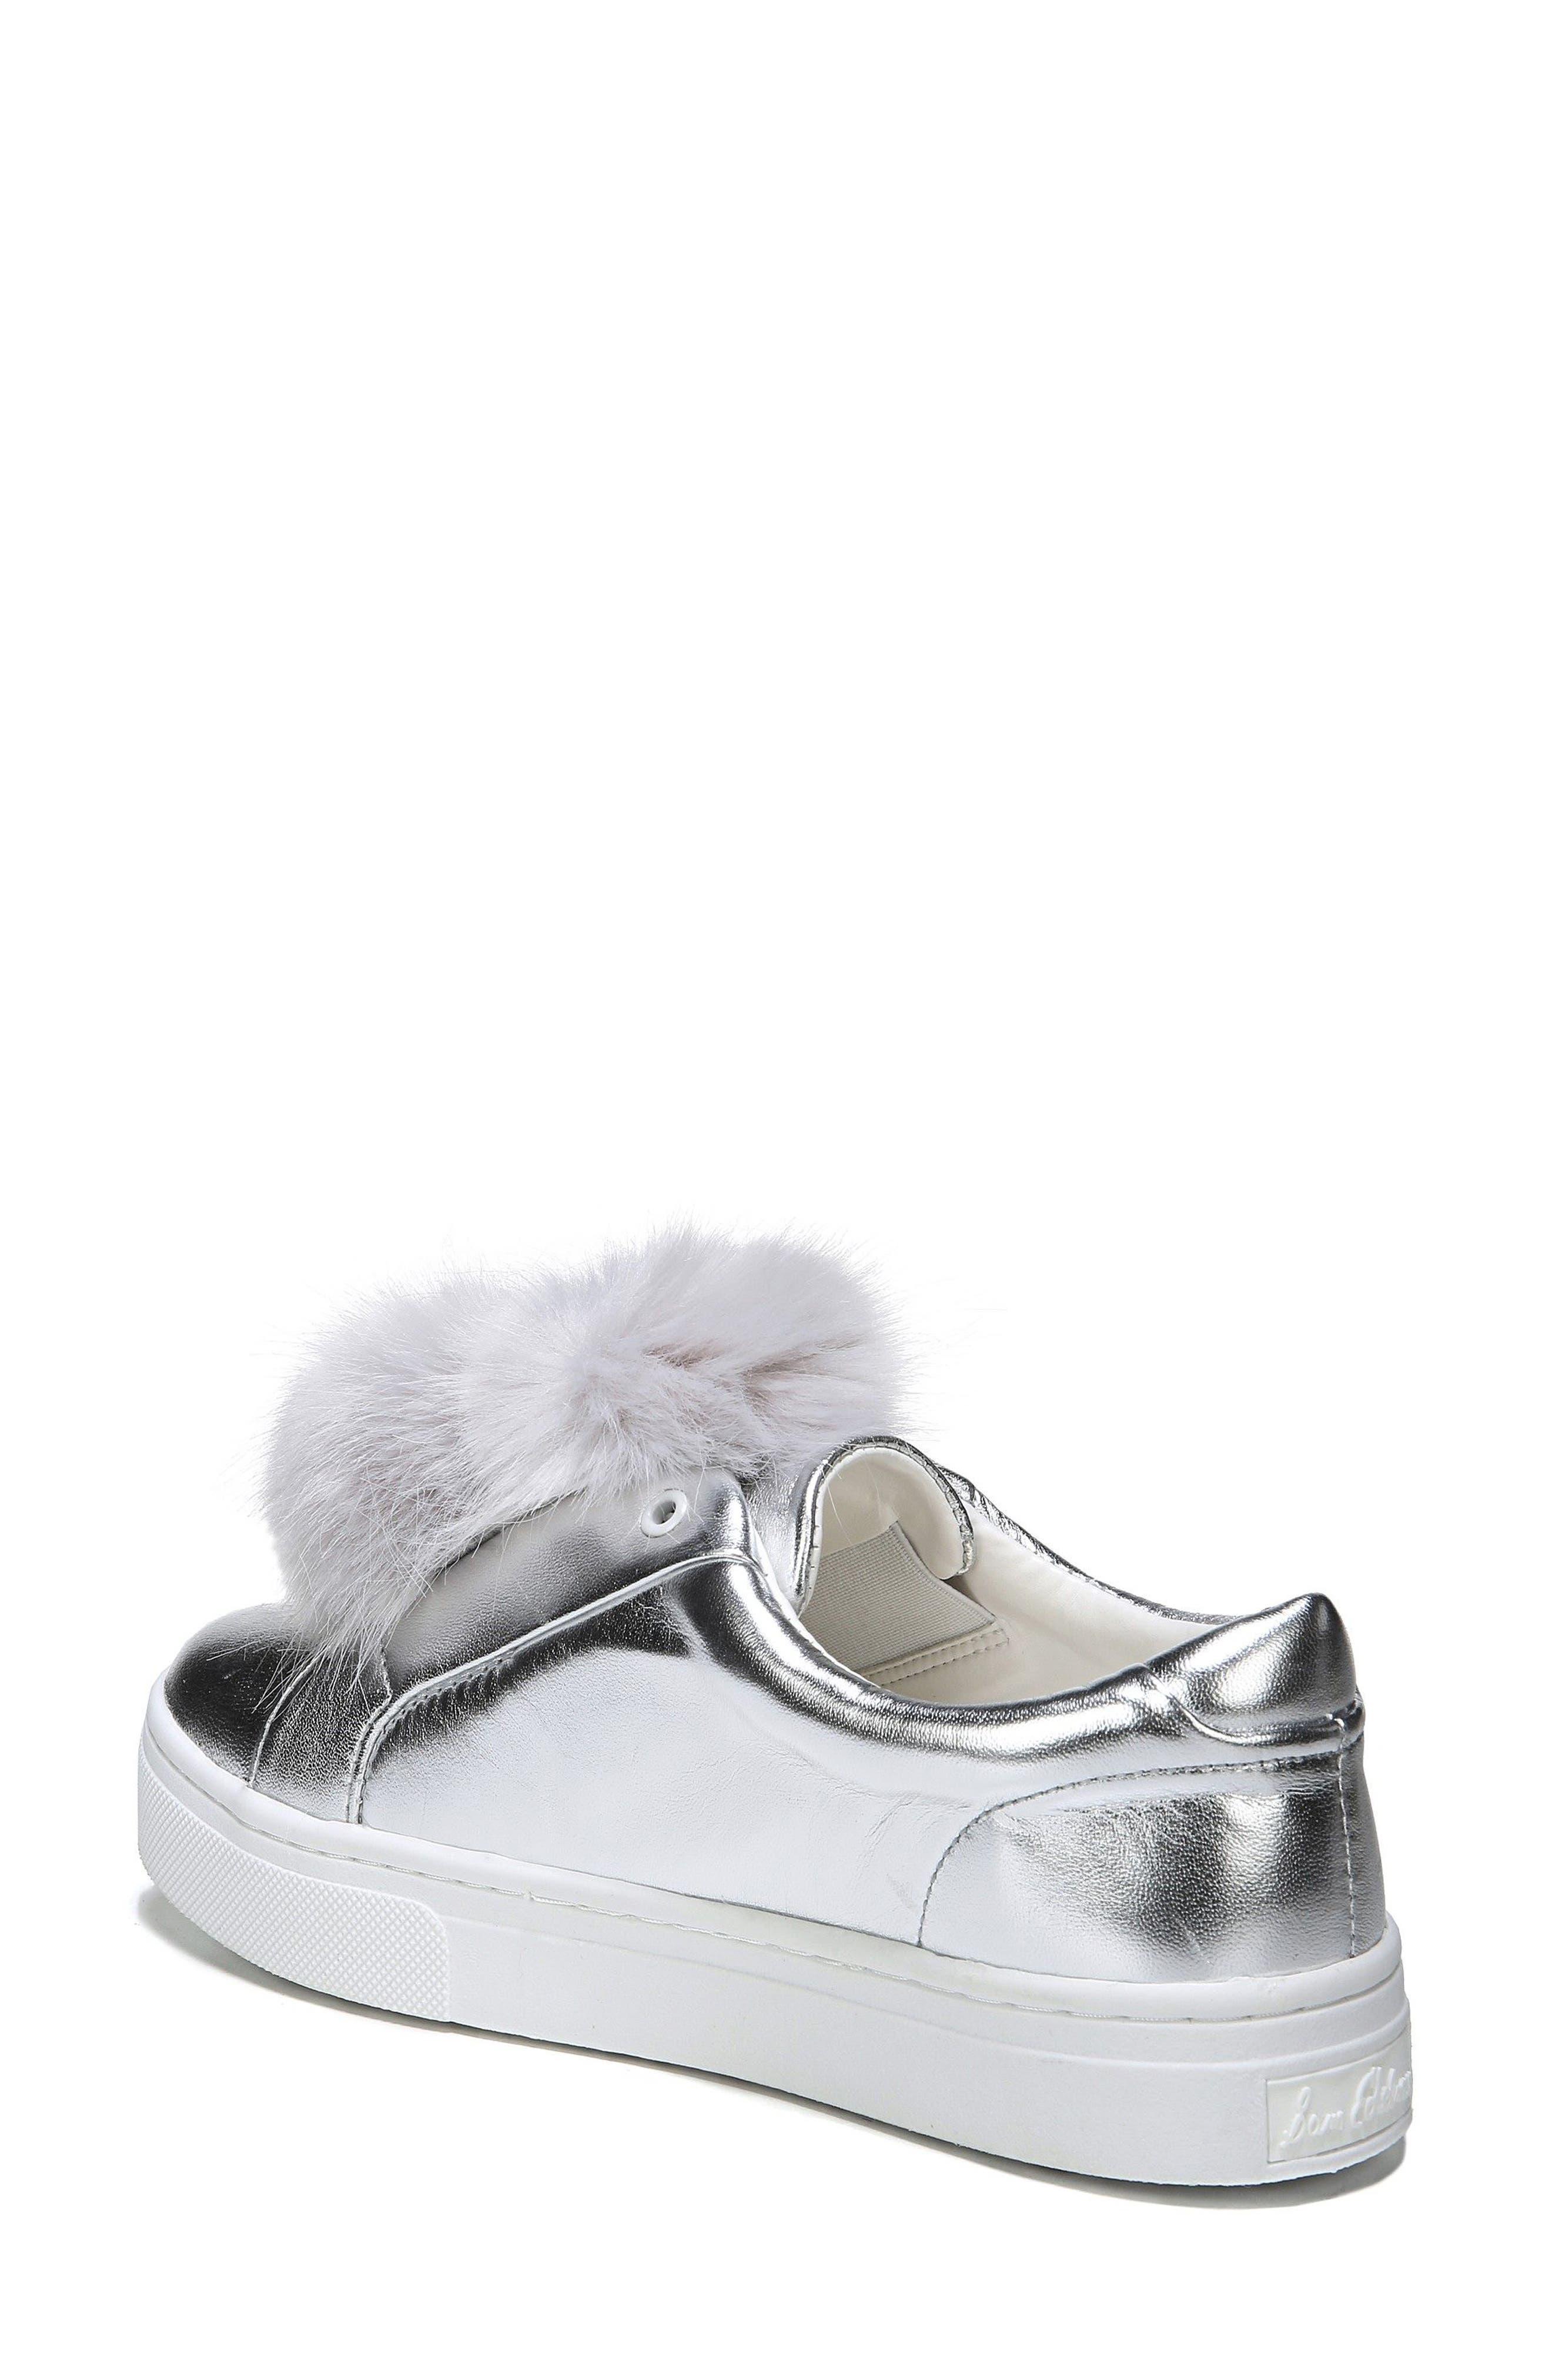 Alternate Image 2  - Sam Edelman 'Leya' Faux Fur Laceless Sneaker (Women)